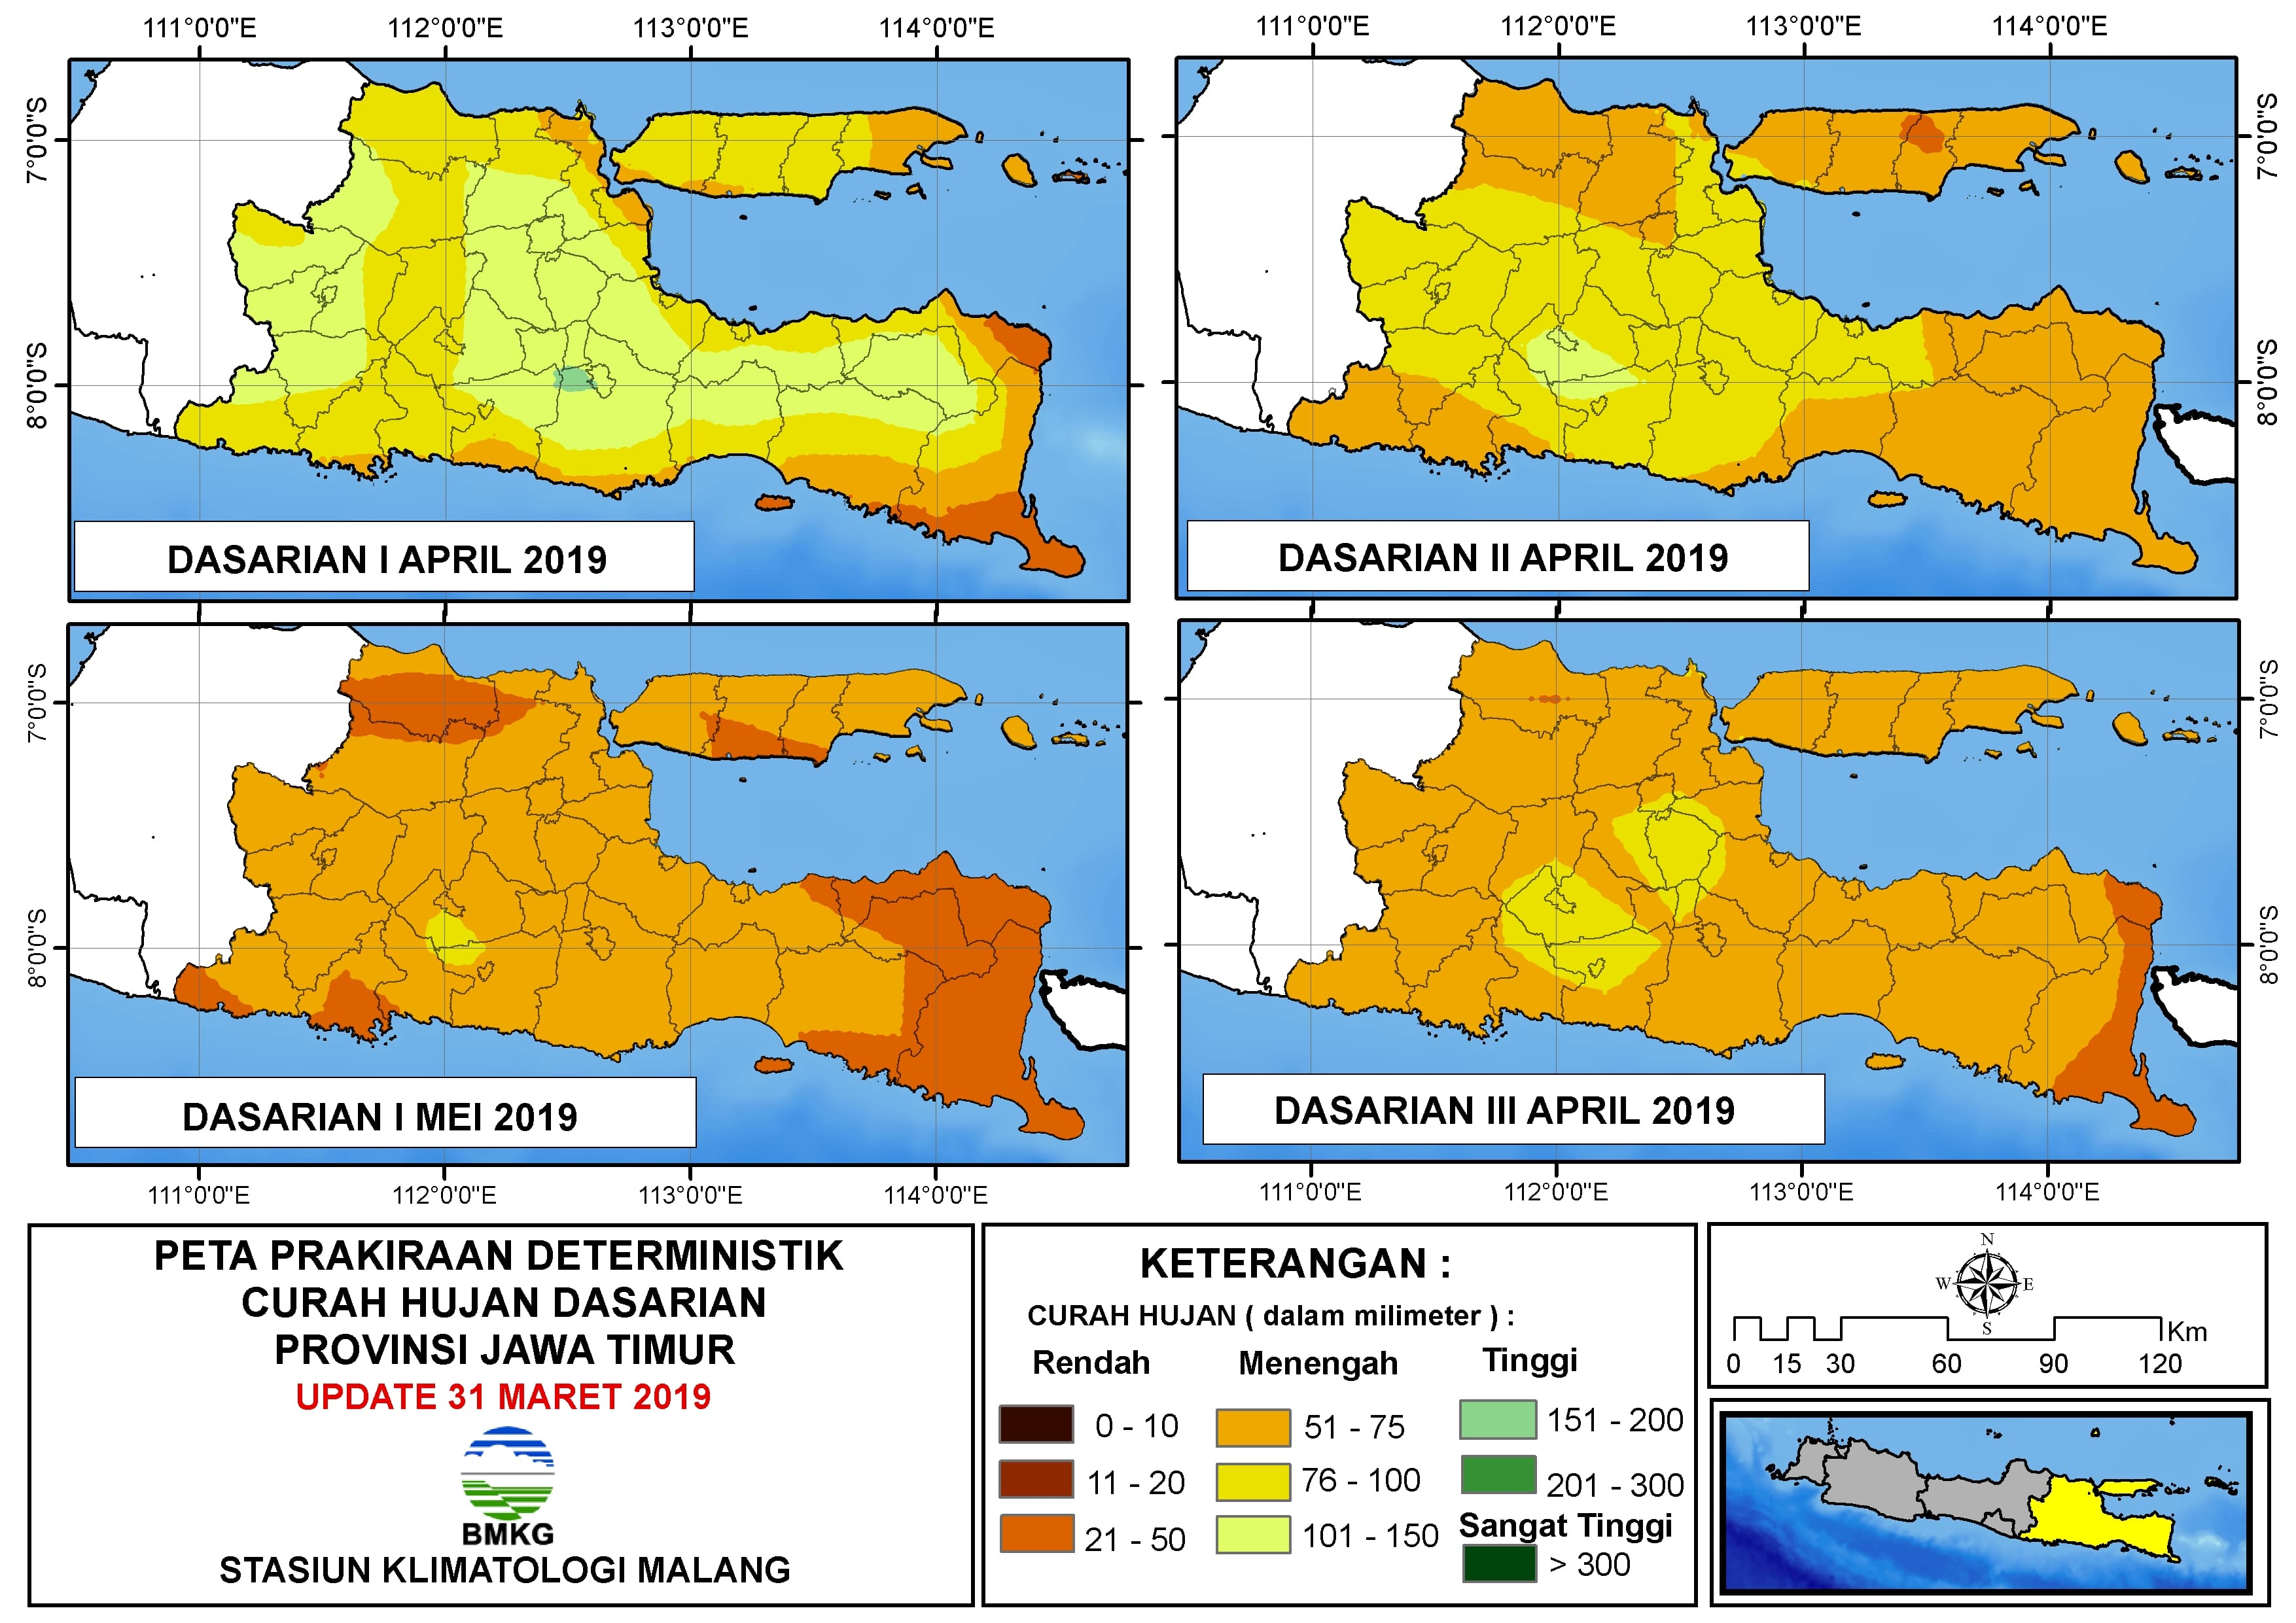 Peta Prakiraan Deterministik Curah Hujan Dasarian I III April I Mei Tahun 2019 Provinsi Jawa Timur Update 31 Maret 2019